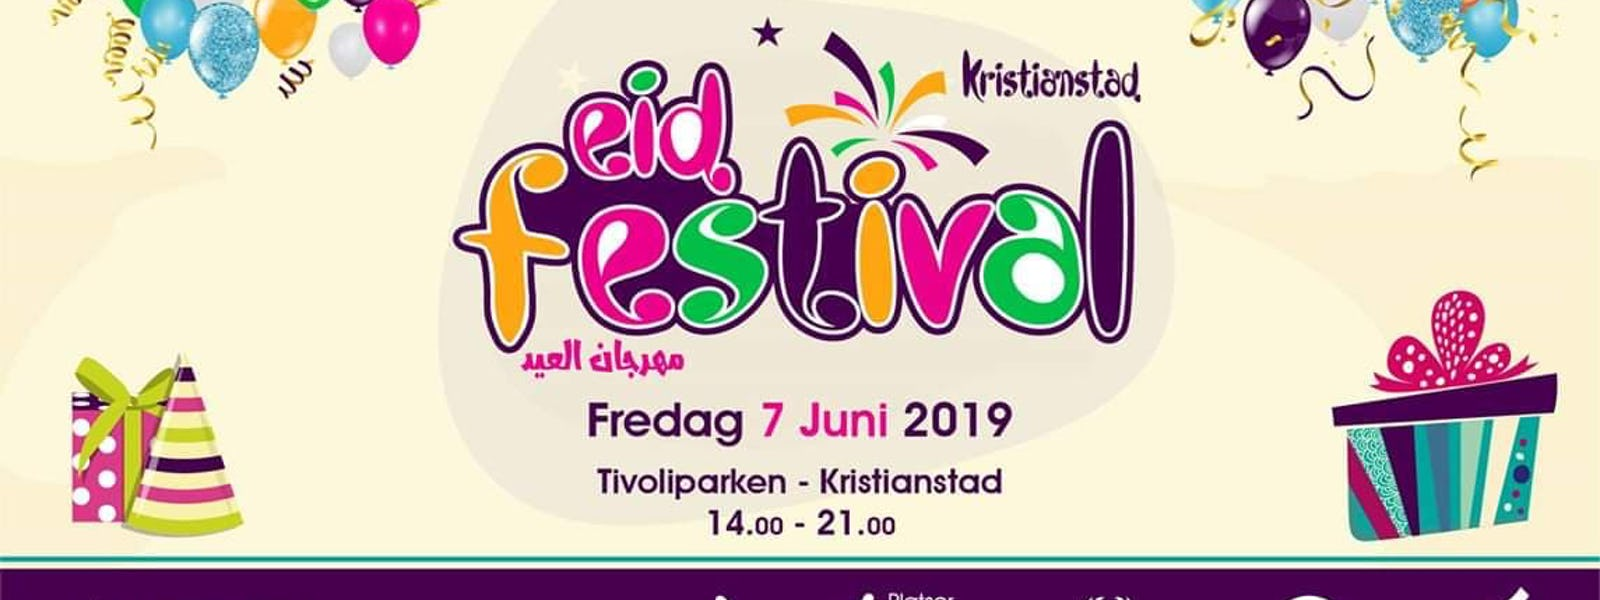 Bild - Eid festival